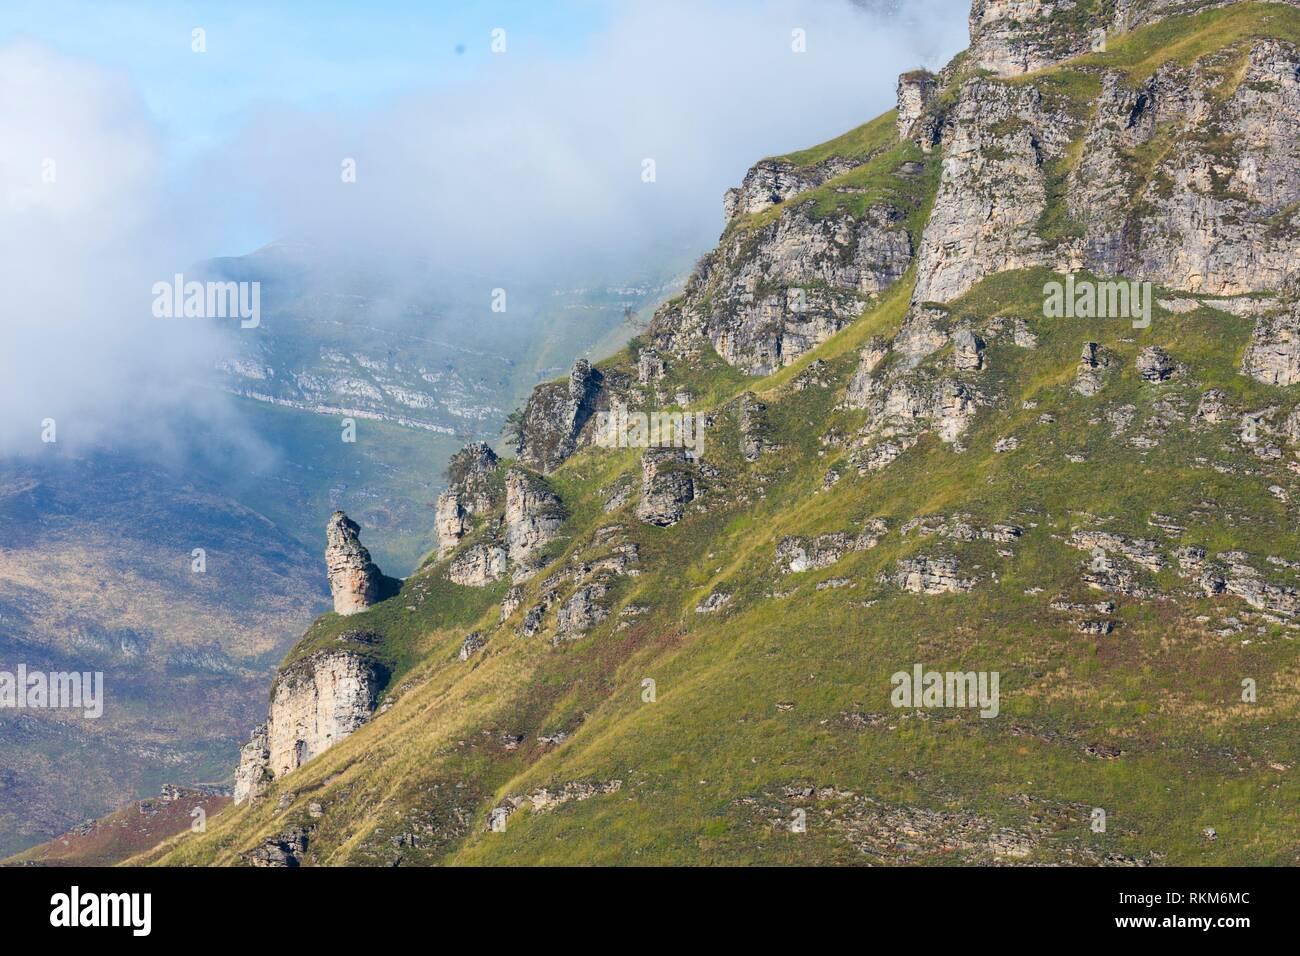 View from Mirador de Covalruyu, Miera Valley, Valles Pasiegos, Cantabria, Spain, Europe. Stock Photo